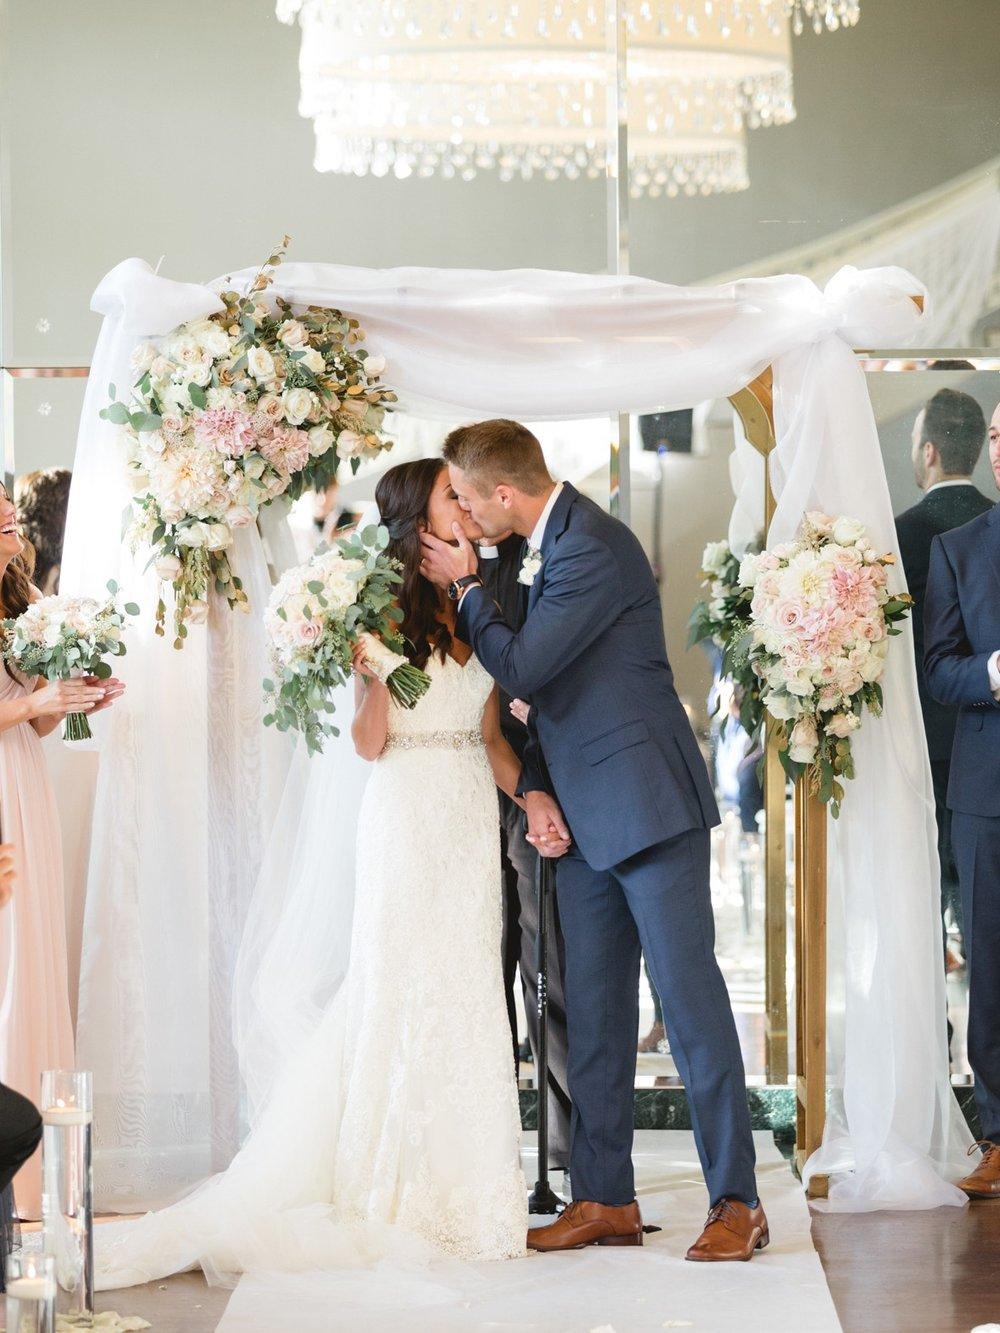 Kristy & Zach     Calhoun Beach Club Wedding